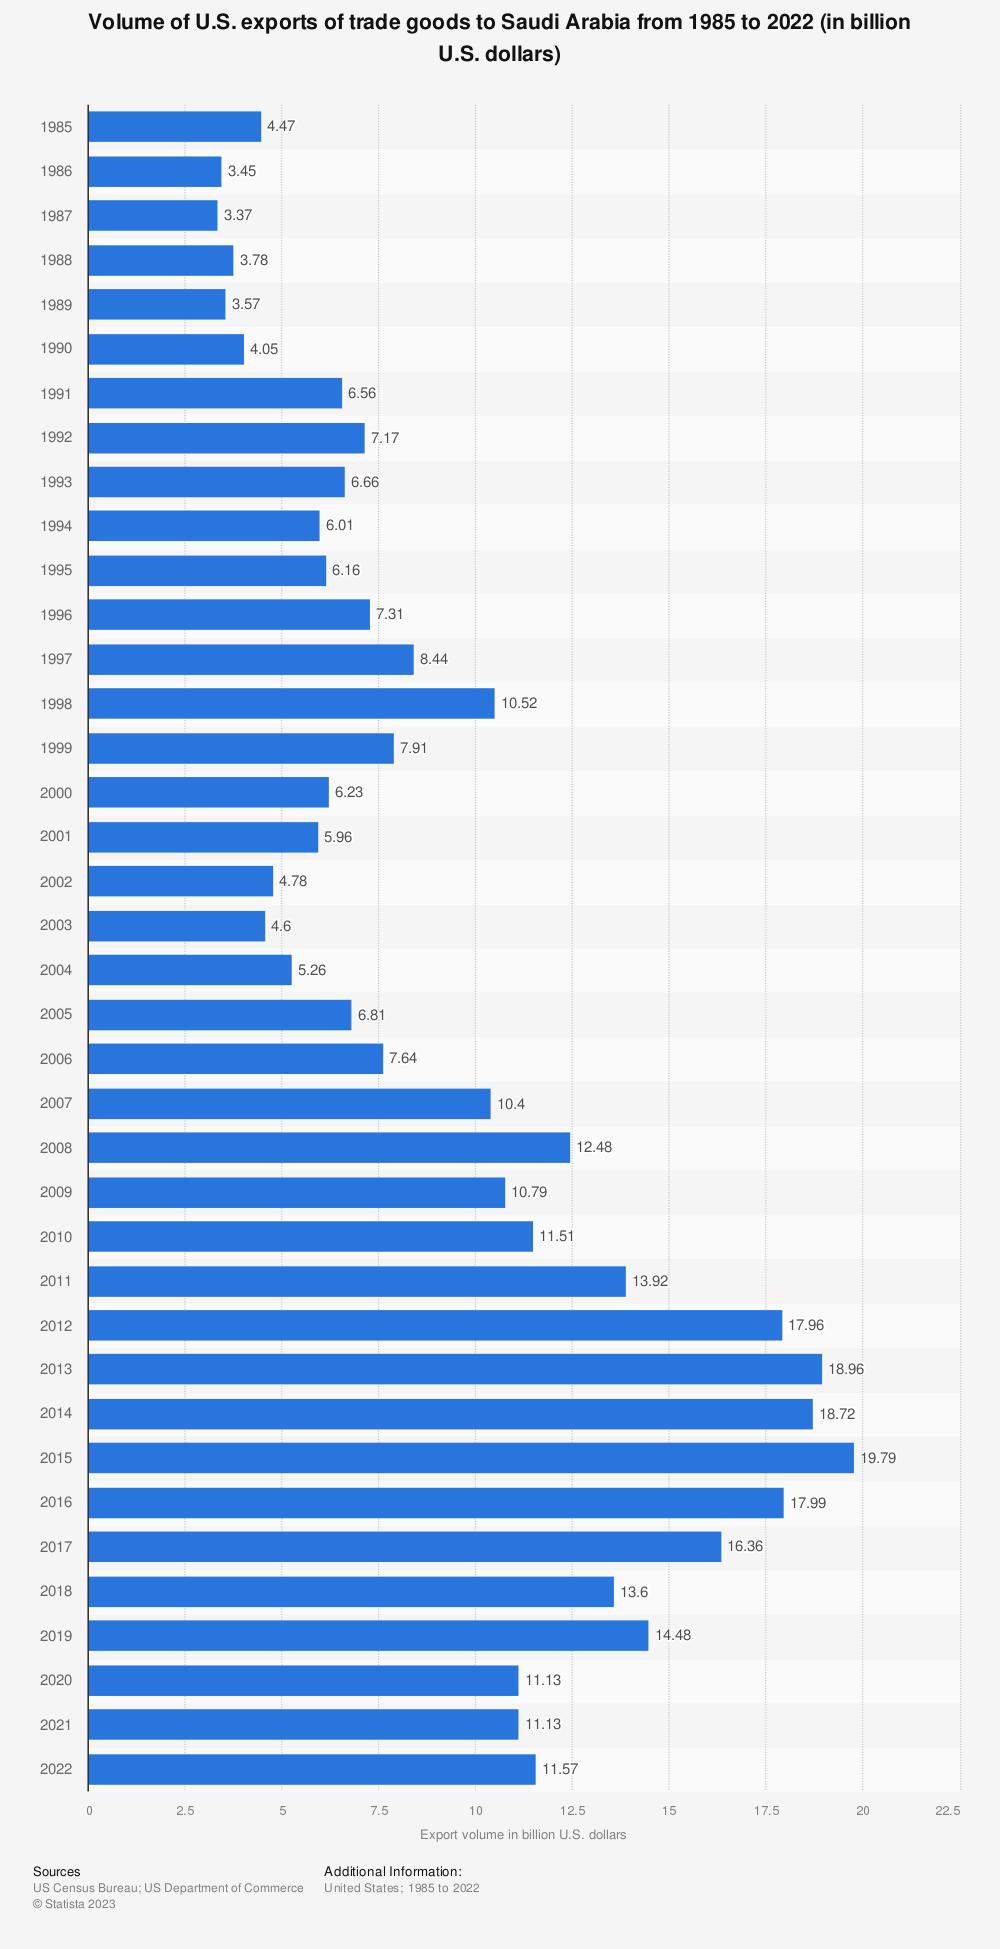 Statistic: Volume of U.S. exports of trade goods to Saudi Arabia from 1985 to 2020 (in billion U.S. dollars) | Statista